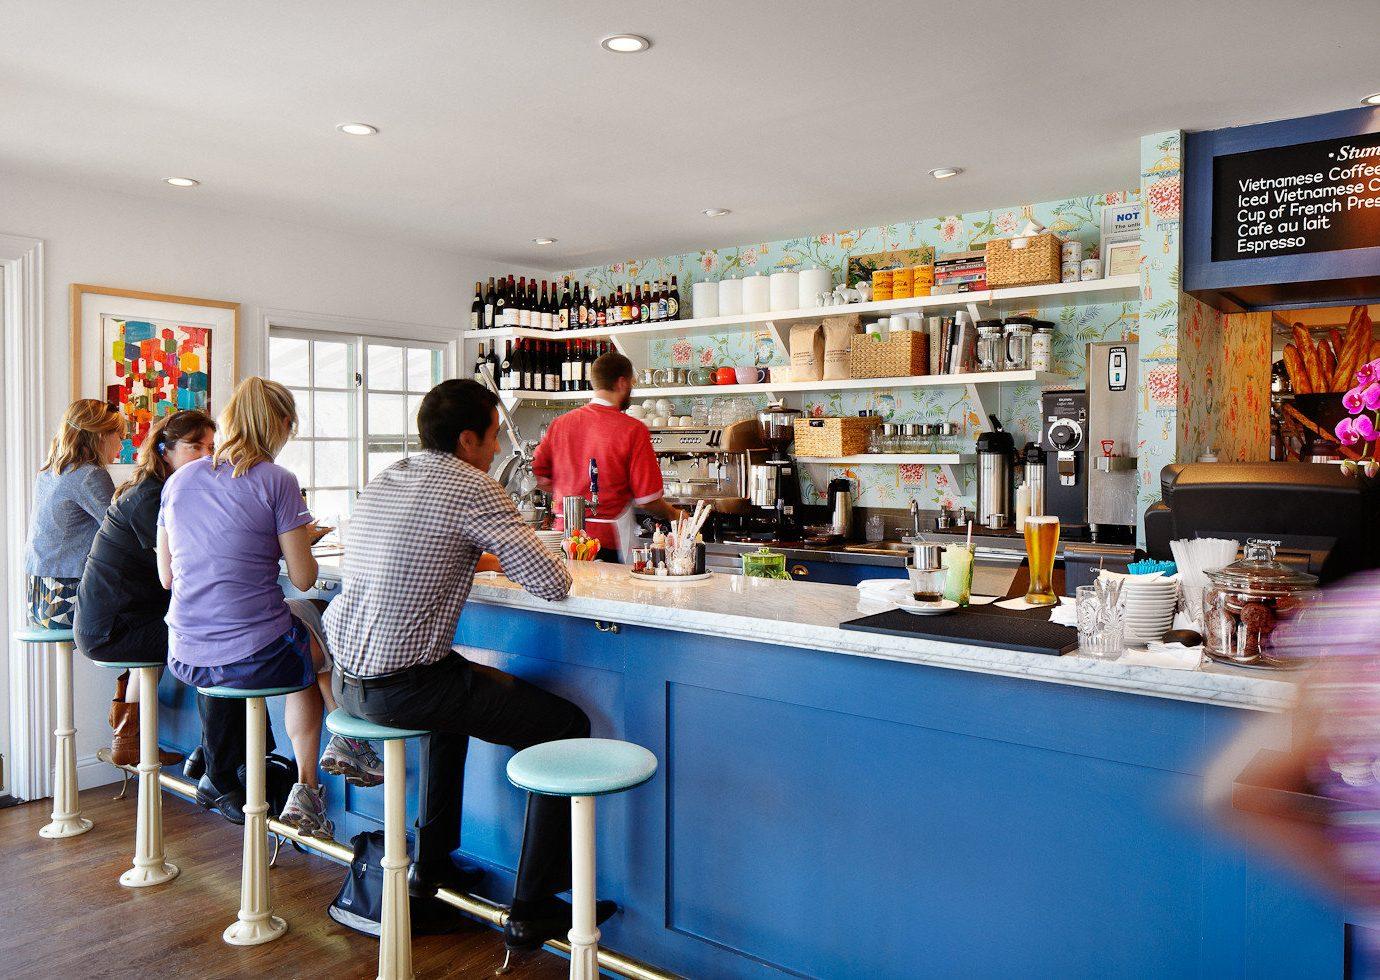 Trip Ideas Weekend Getaways indoor floor ceiling interior design restaurant retail Design Bar